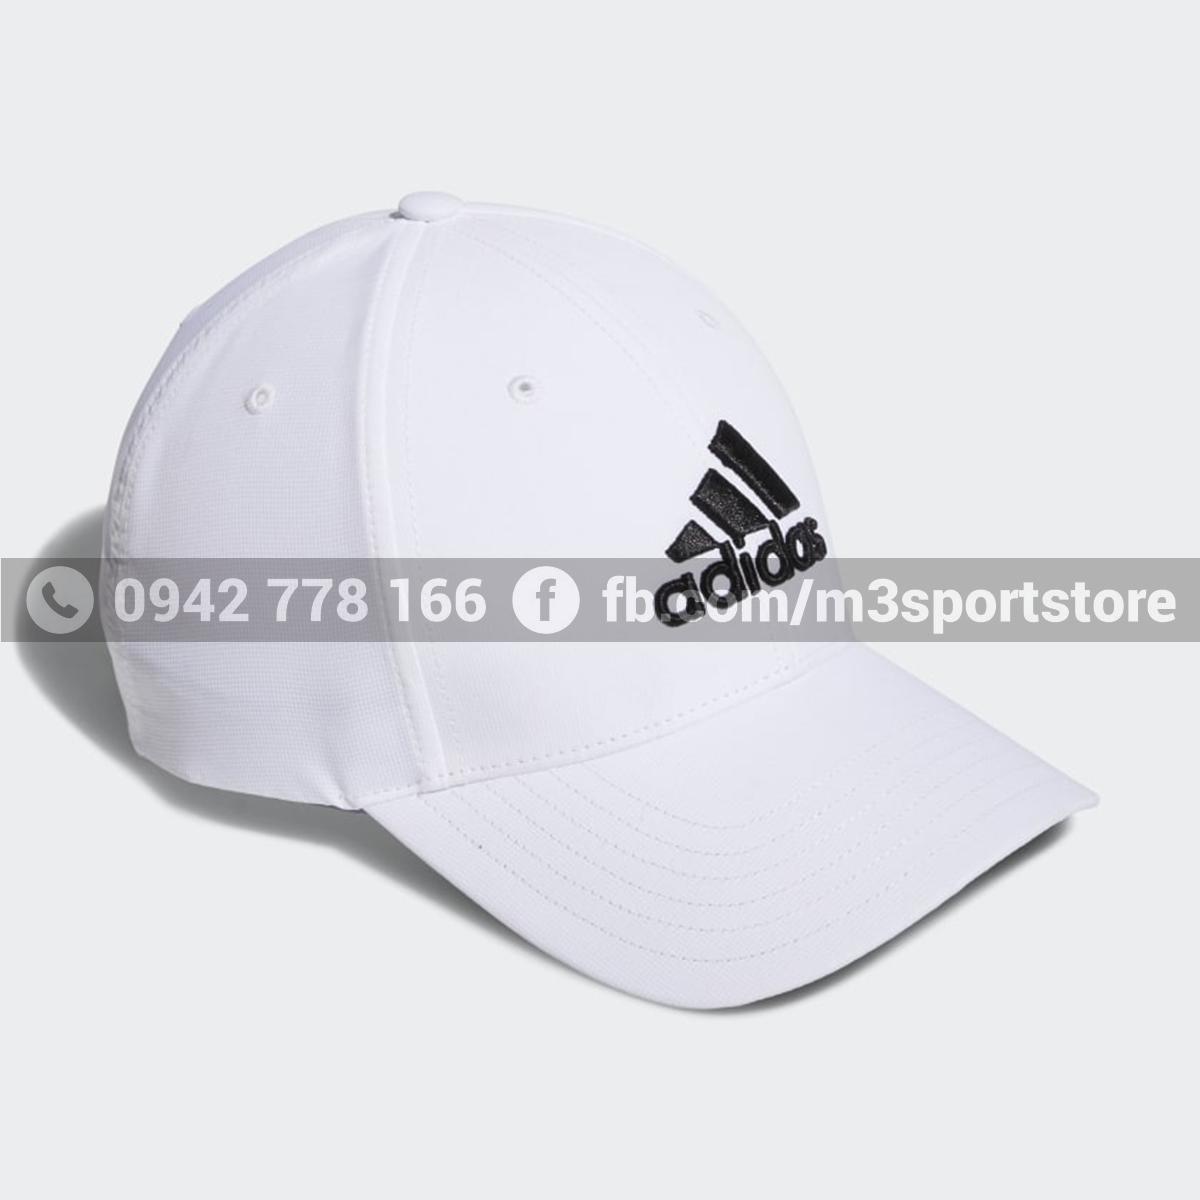 Mũ thể thao Adidas PERFORMANCE FJ1797